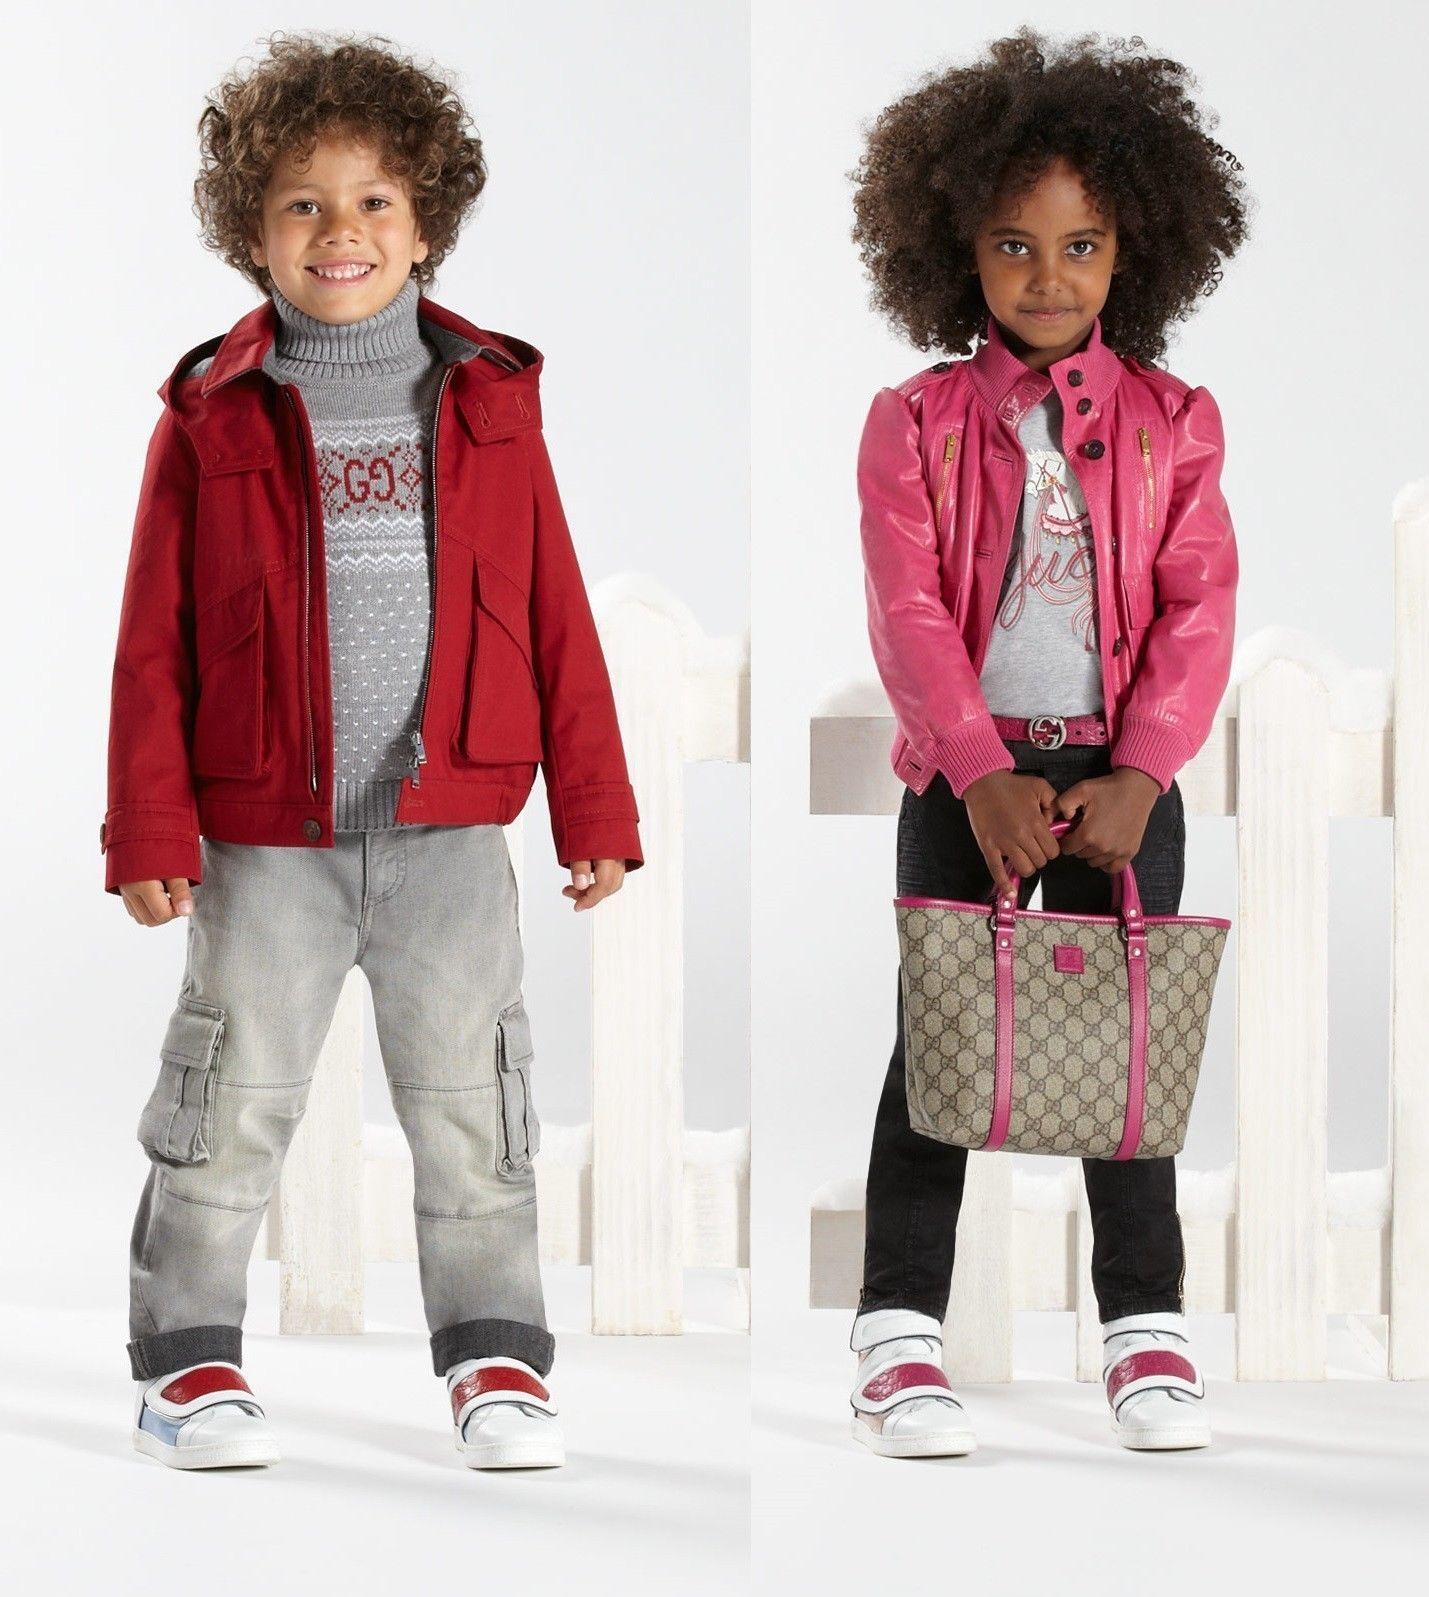 NIB NEW Gucci girls pink yellow red white Coda high top sneakers 21 22 26 301353